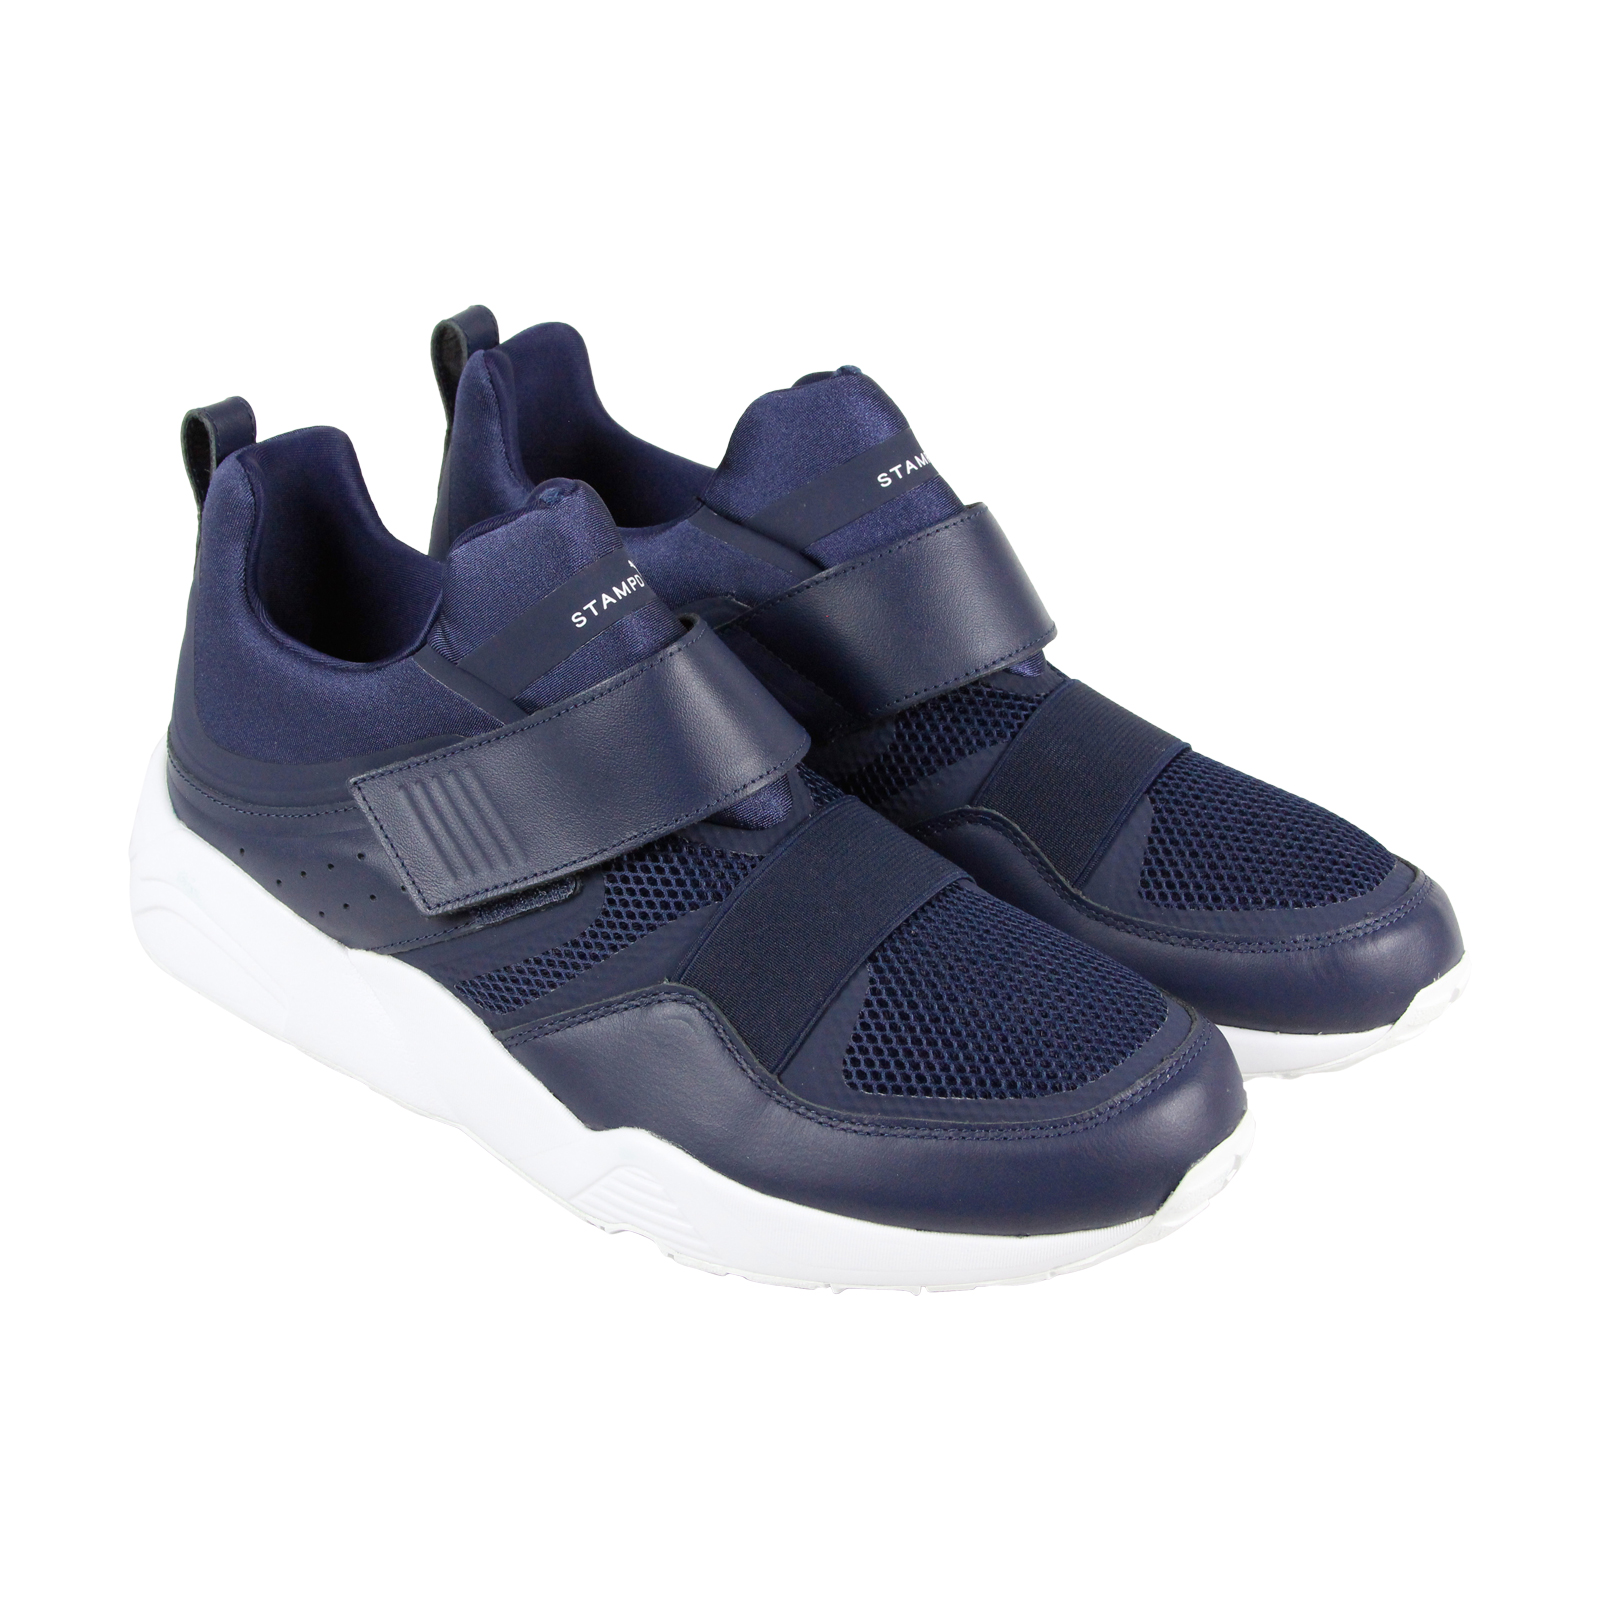 Puma Blaze Of Glory Strap X Stampd homme Bleu Leather athlétique Training chaussures 11